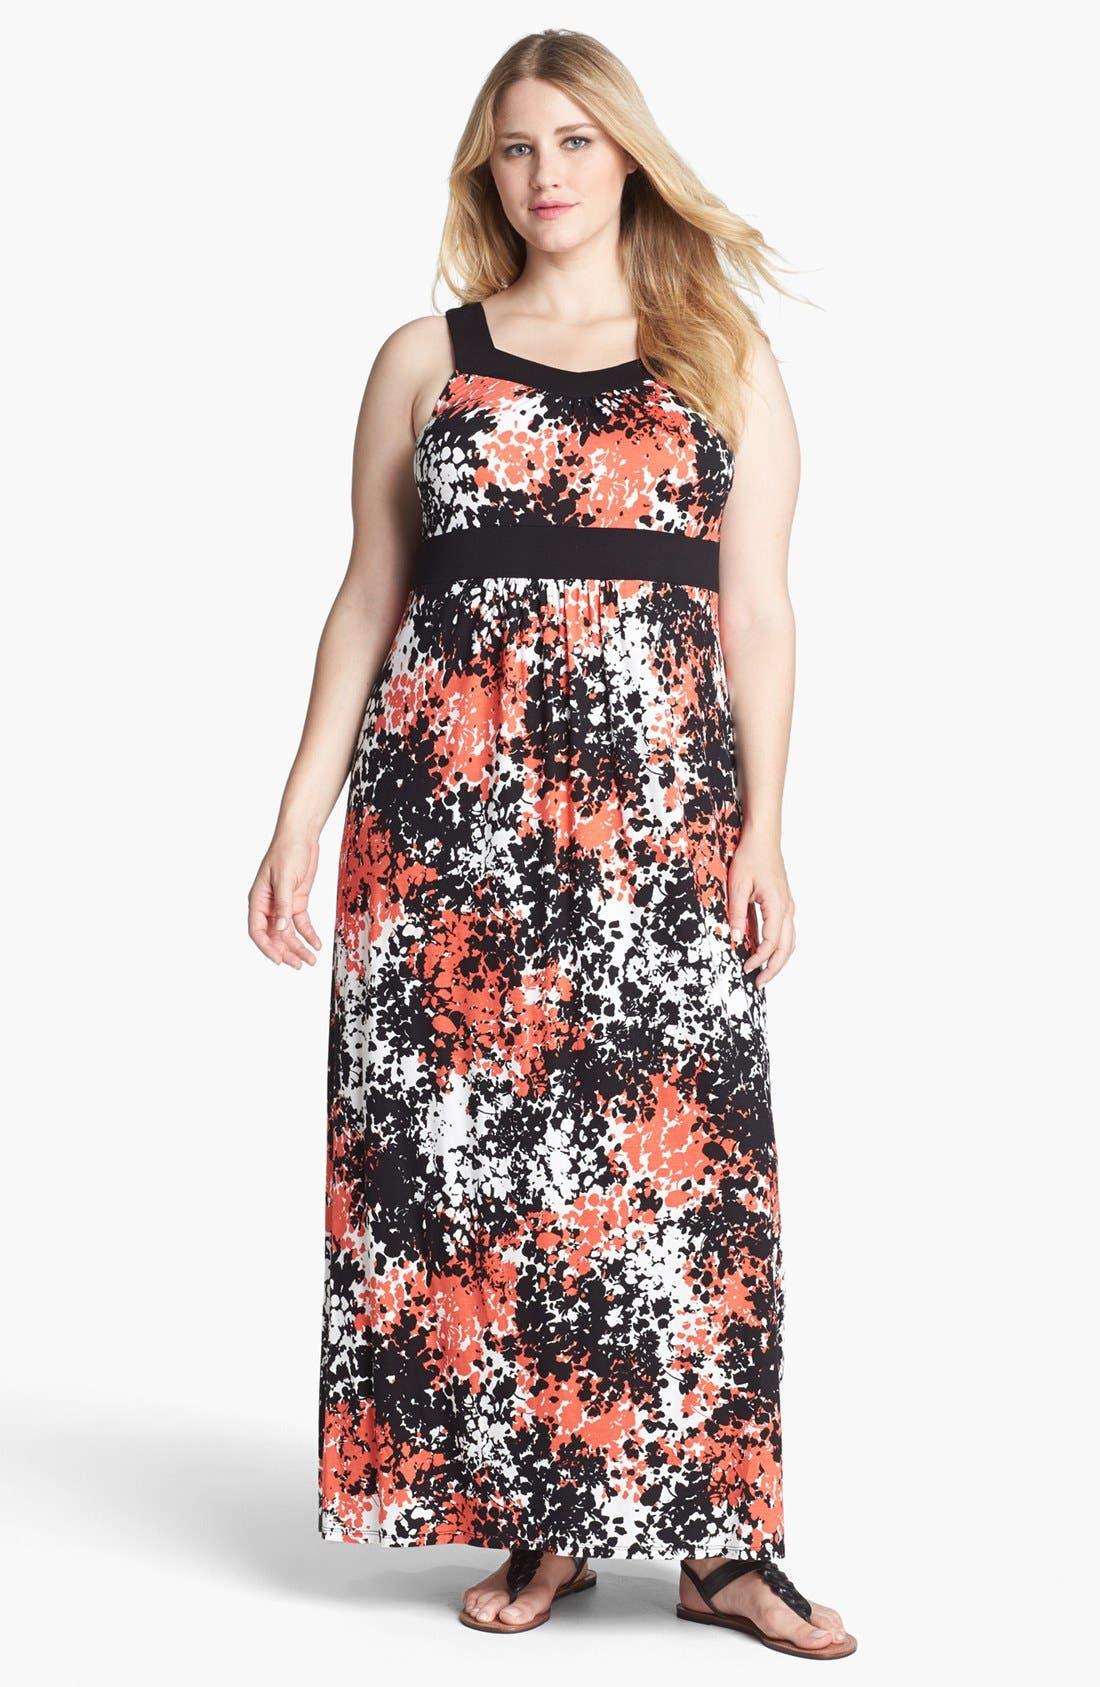 Alternate Image 1 Selected - Evans Print Jersey Maxi Dress (Plus Size)